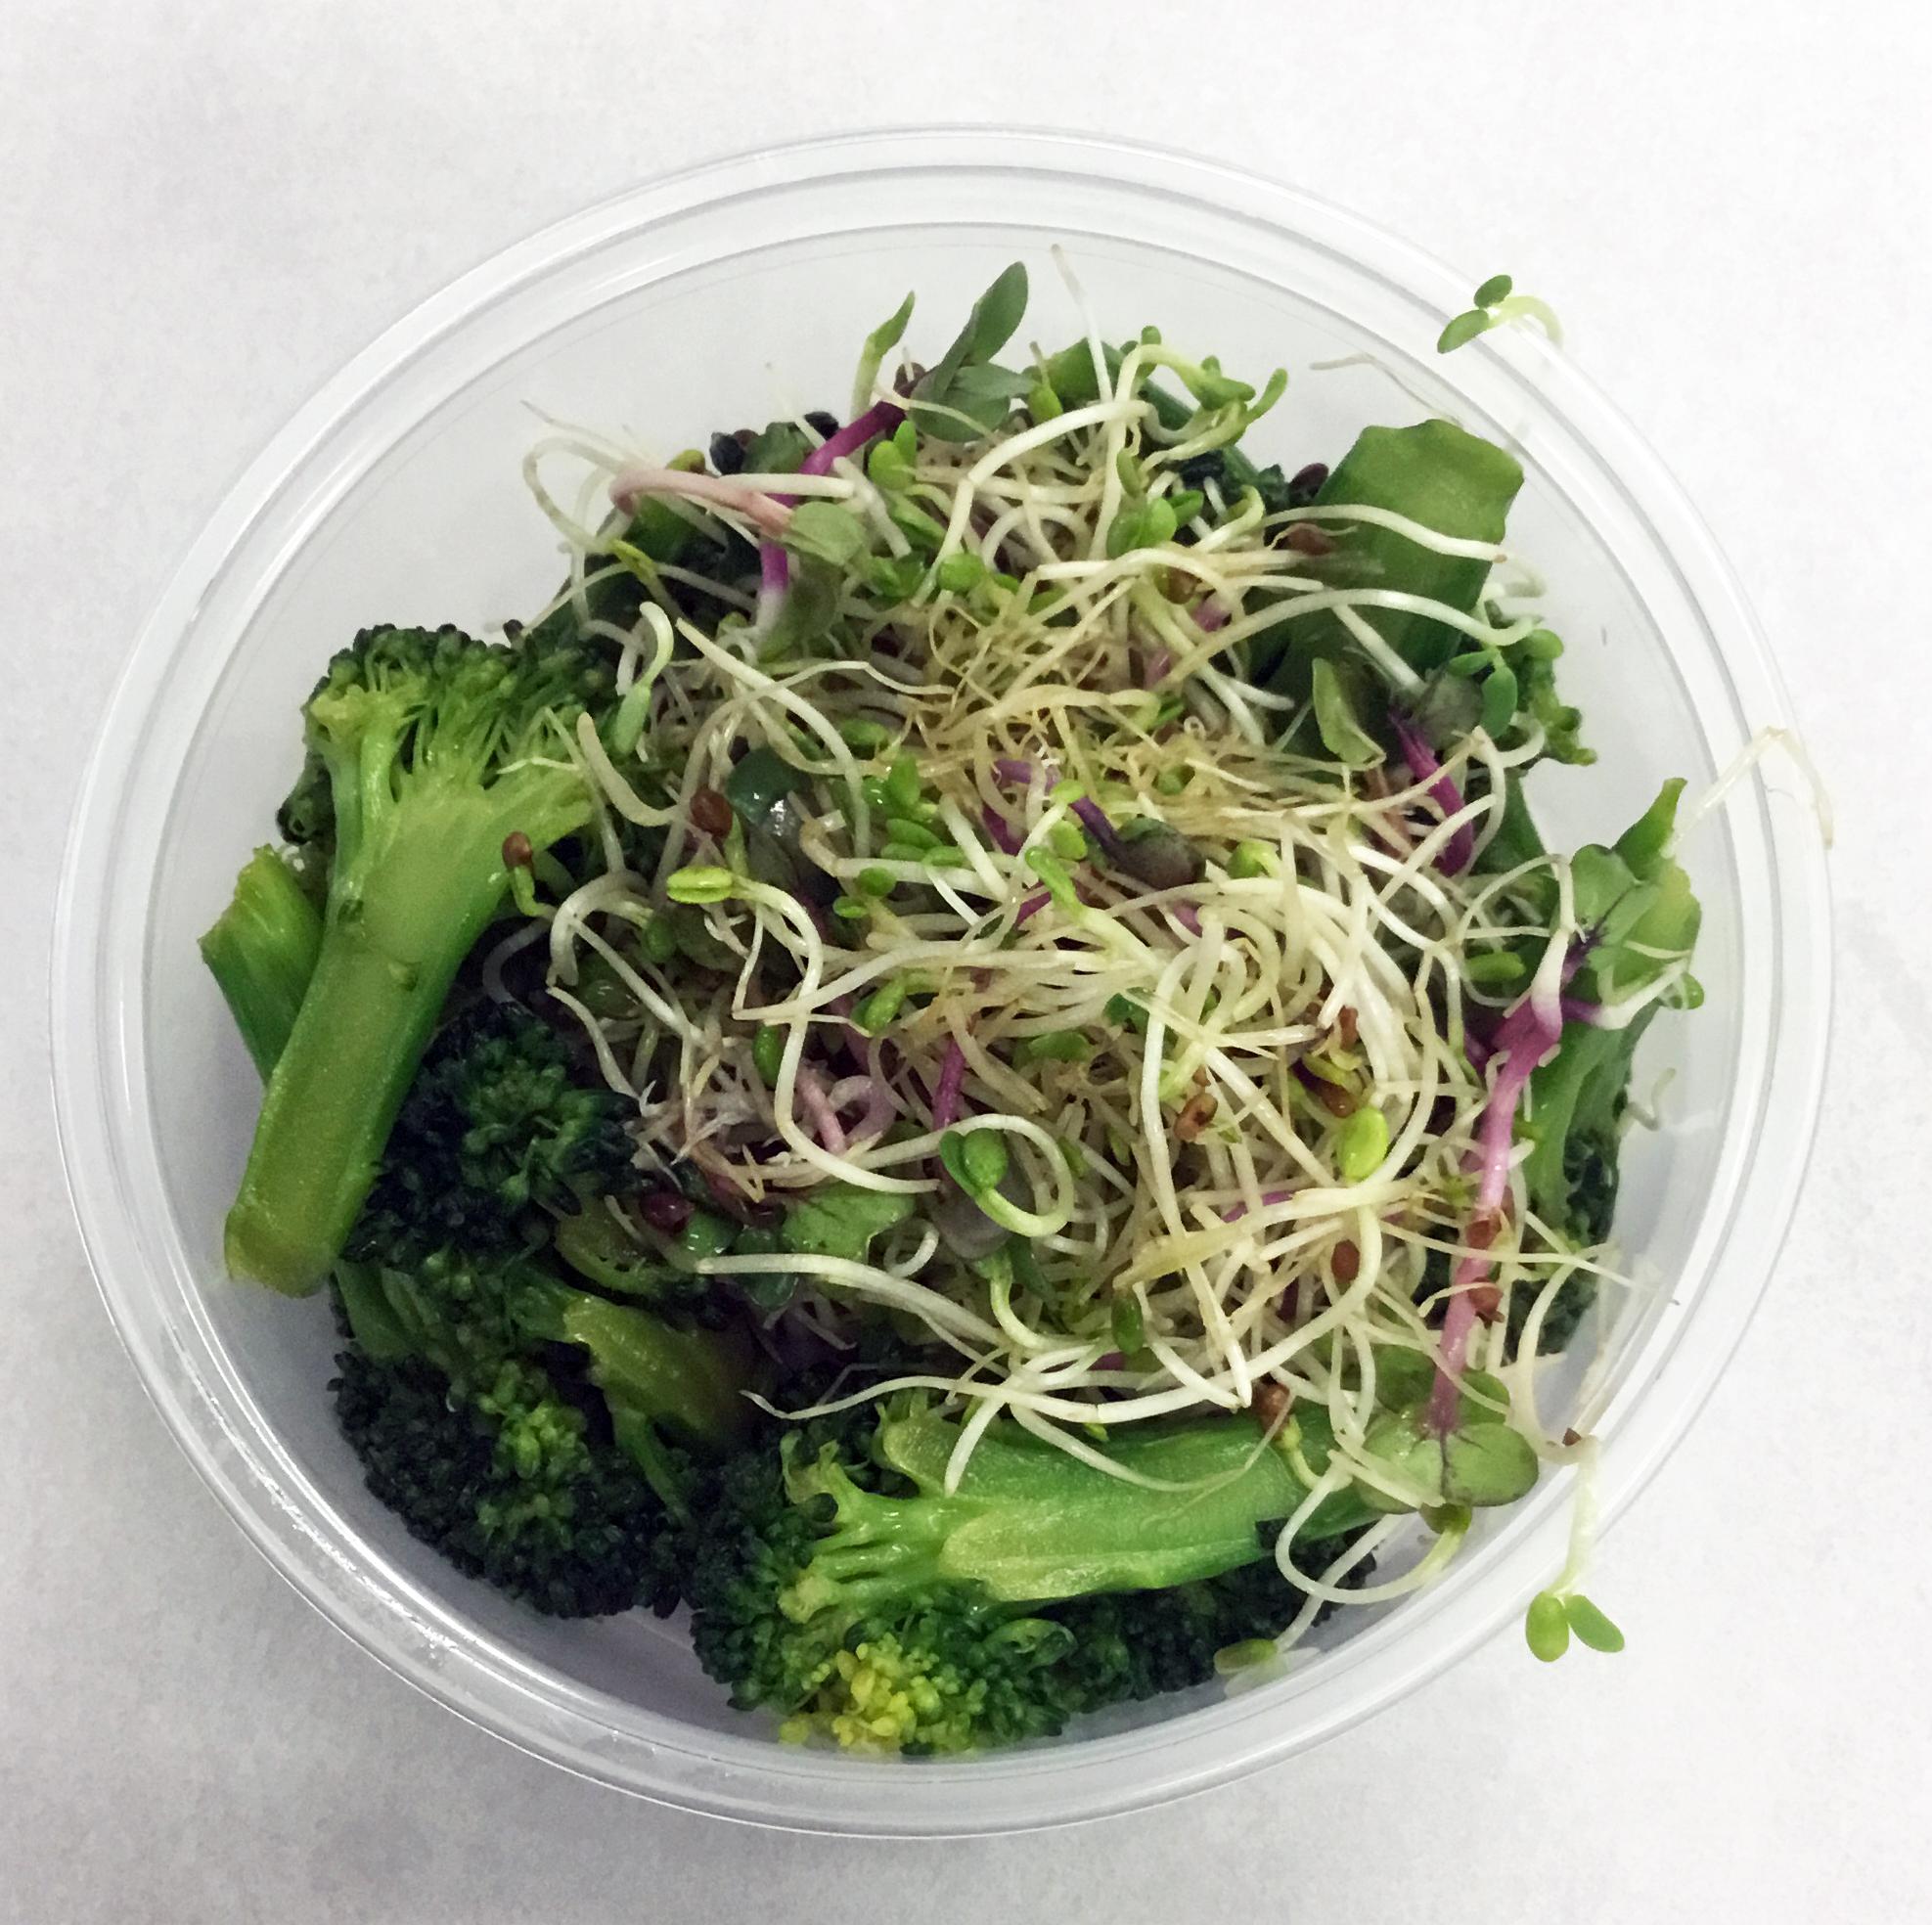 Teriyaki broccoli with alfalfa sprouts.